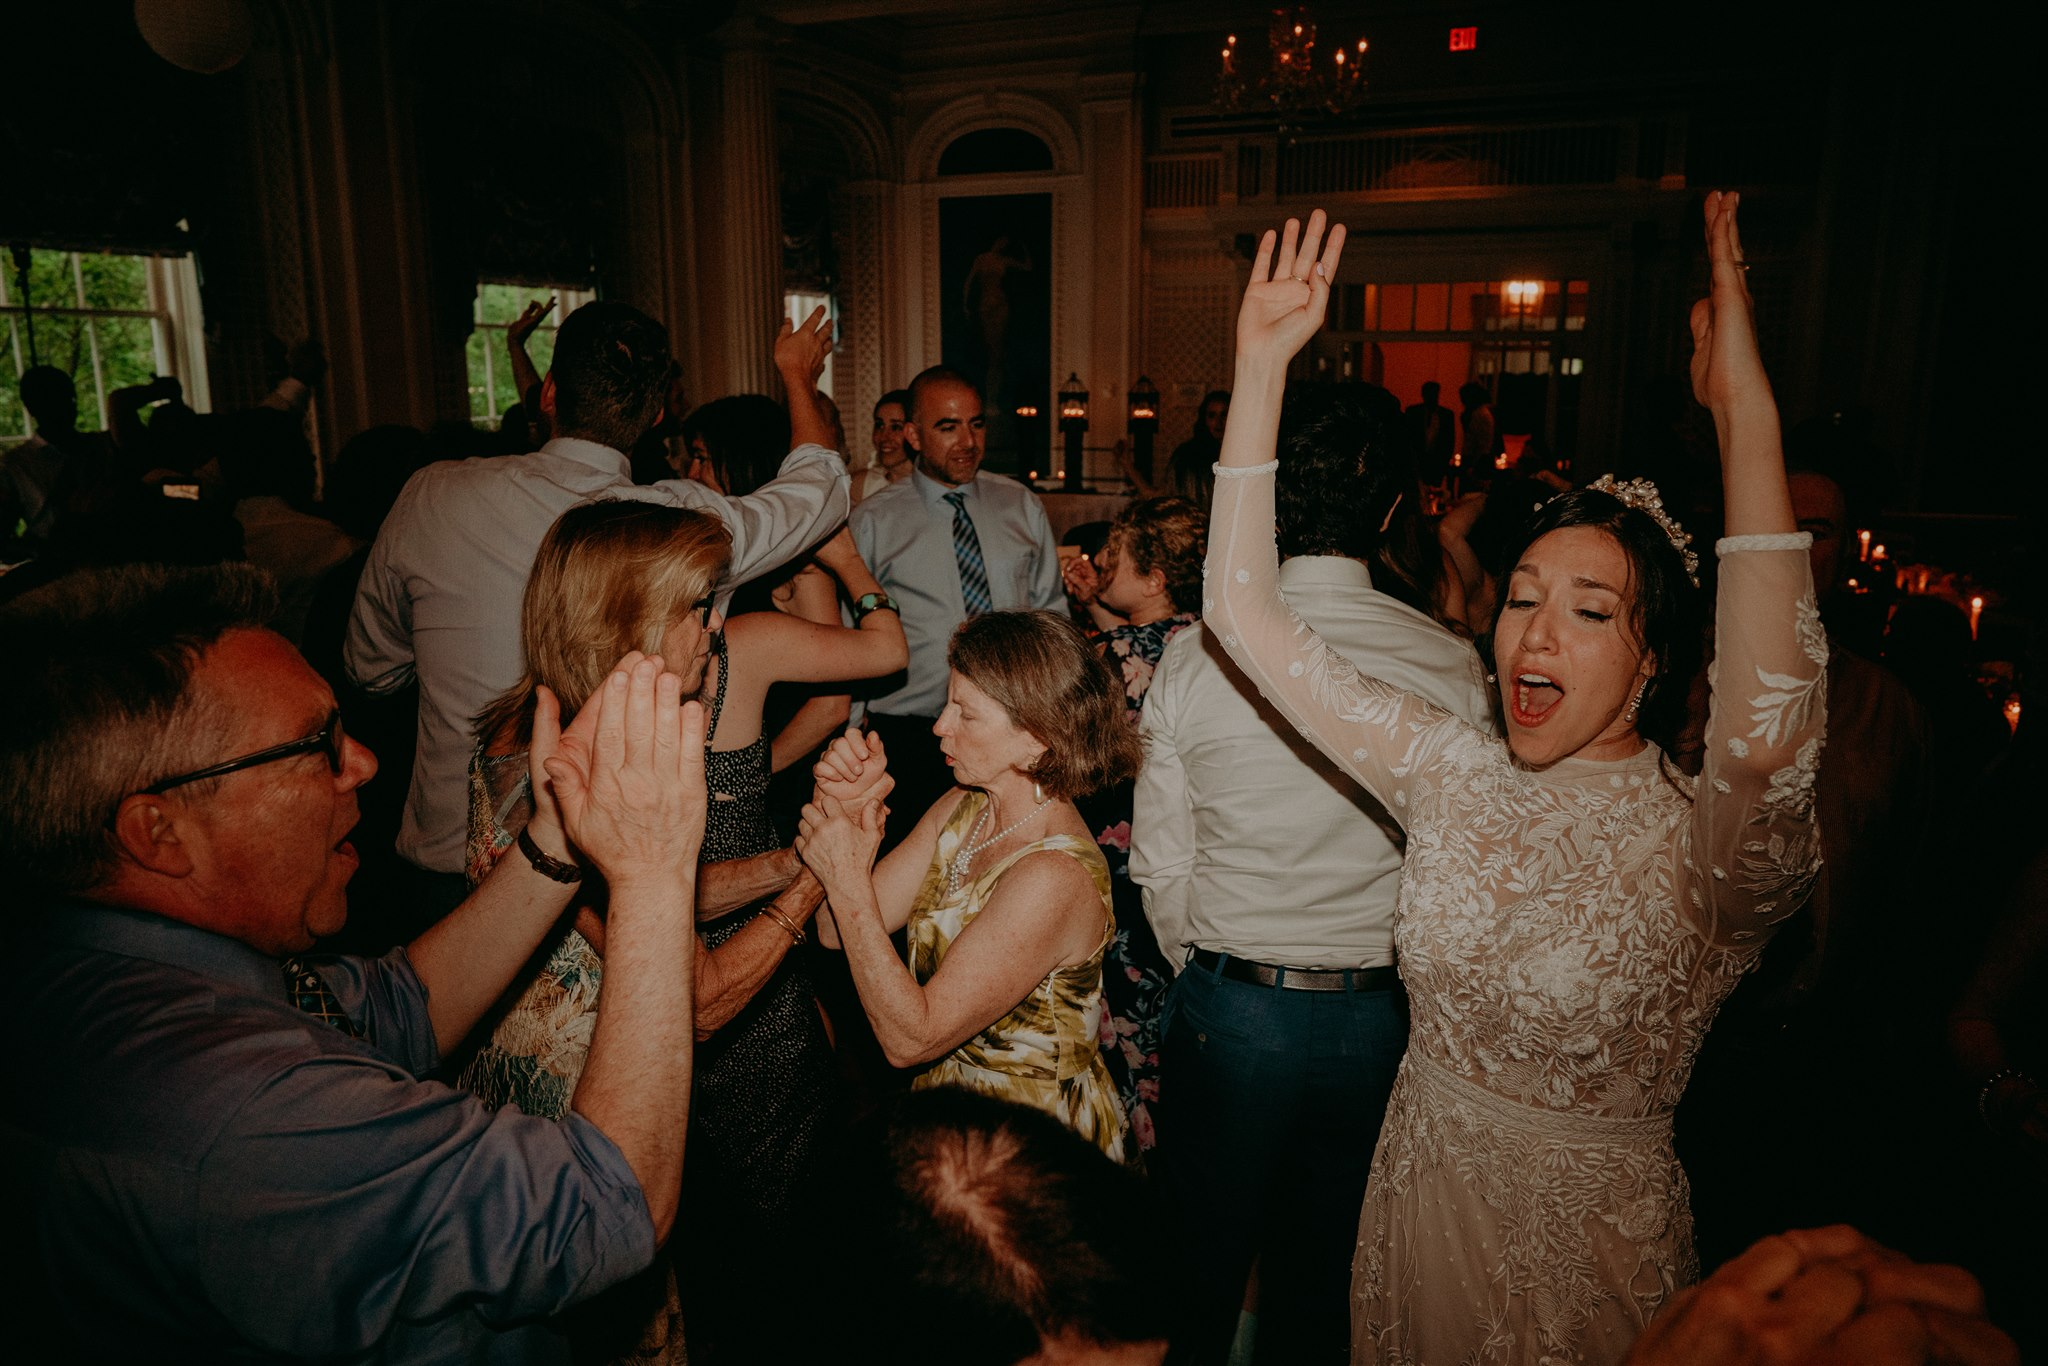 Chellise_Michael_Photography_Hudson_Valley_Wedding_Photographer_Otesaga_Hotel-6050.jpg